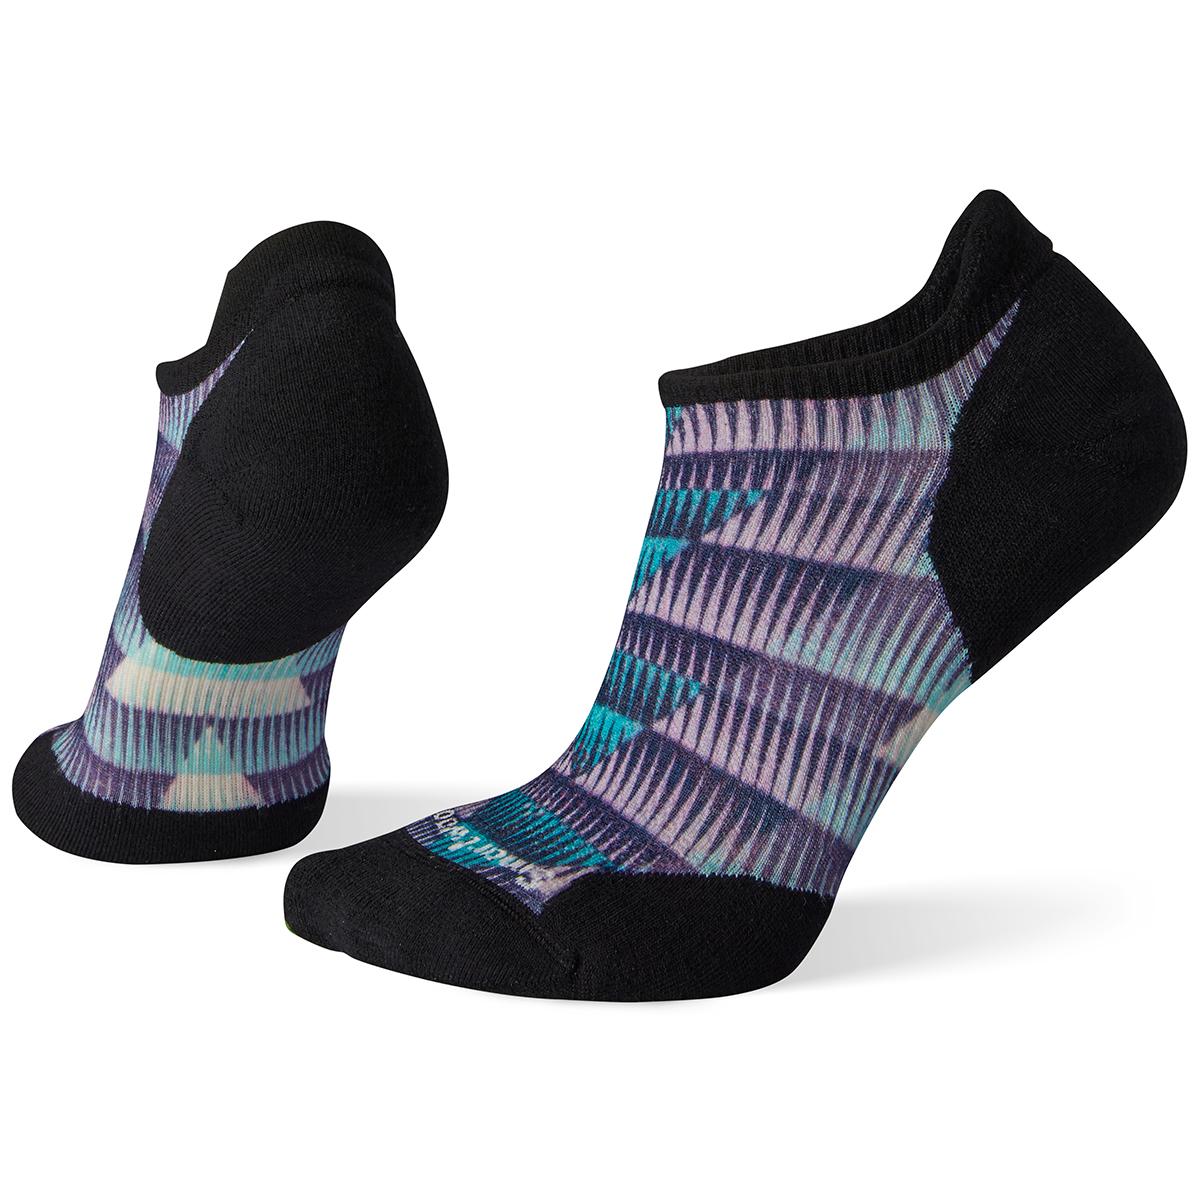 Smartwool Women's Phd Run Light Elite Chevron Print Micro Socks - Blue, M